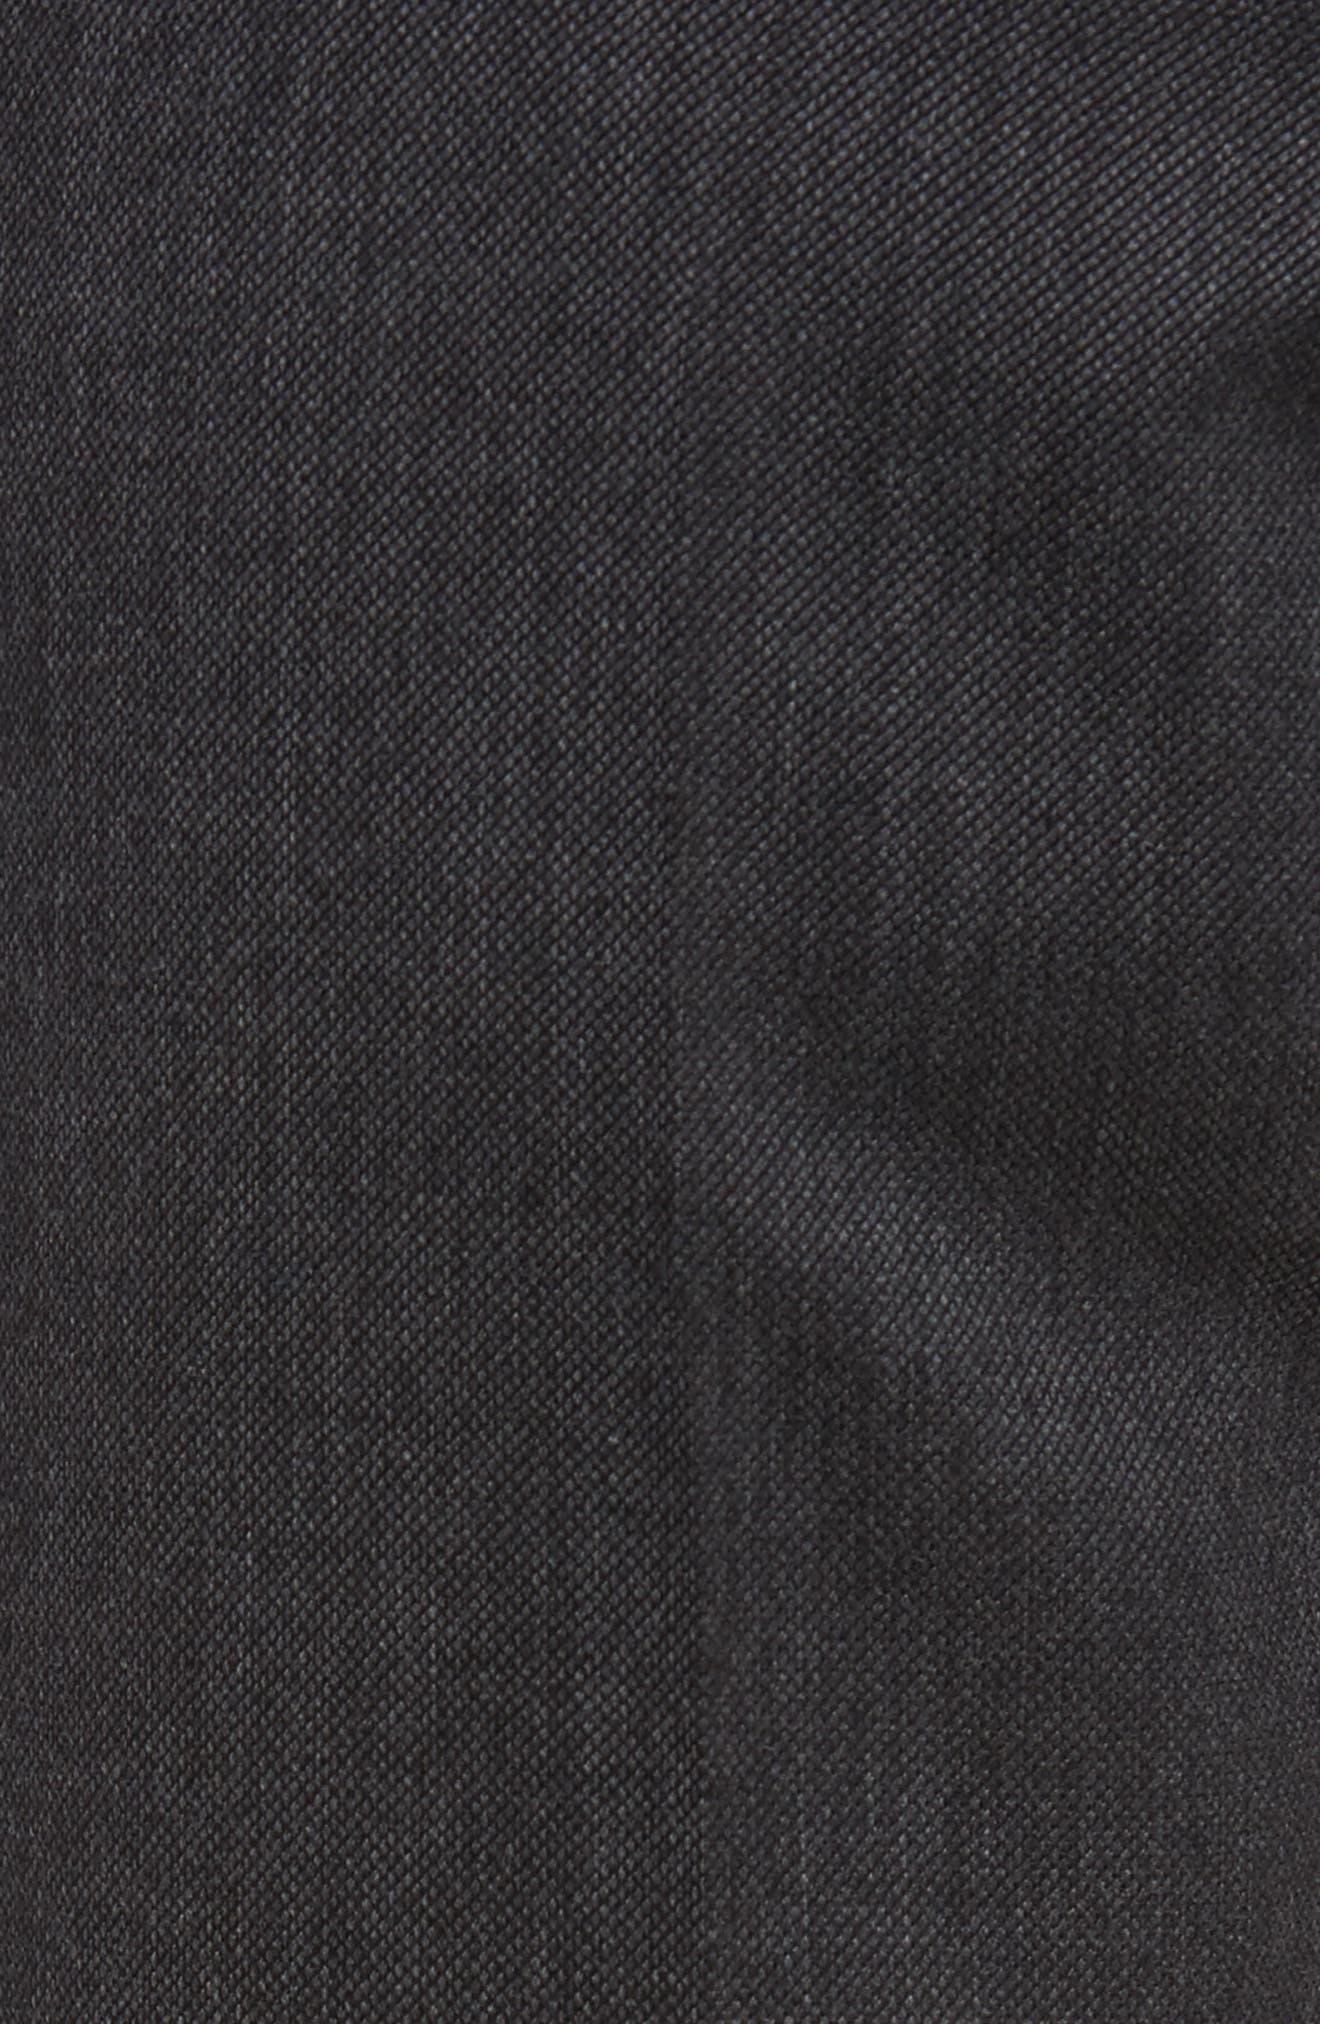 Benson Flat Front Wool Blend Trousers,                             Alternate thumbnail 2, color,                             025